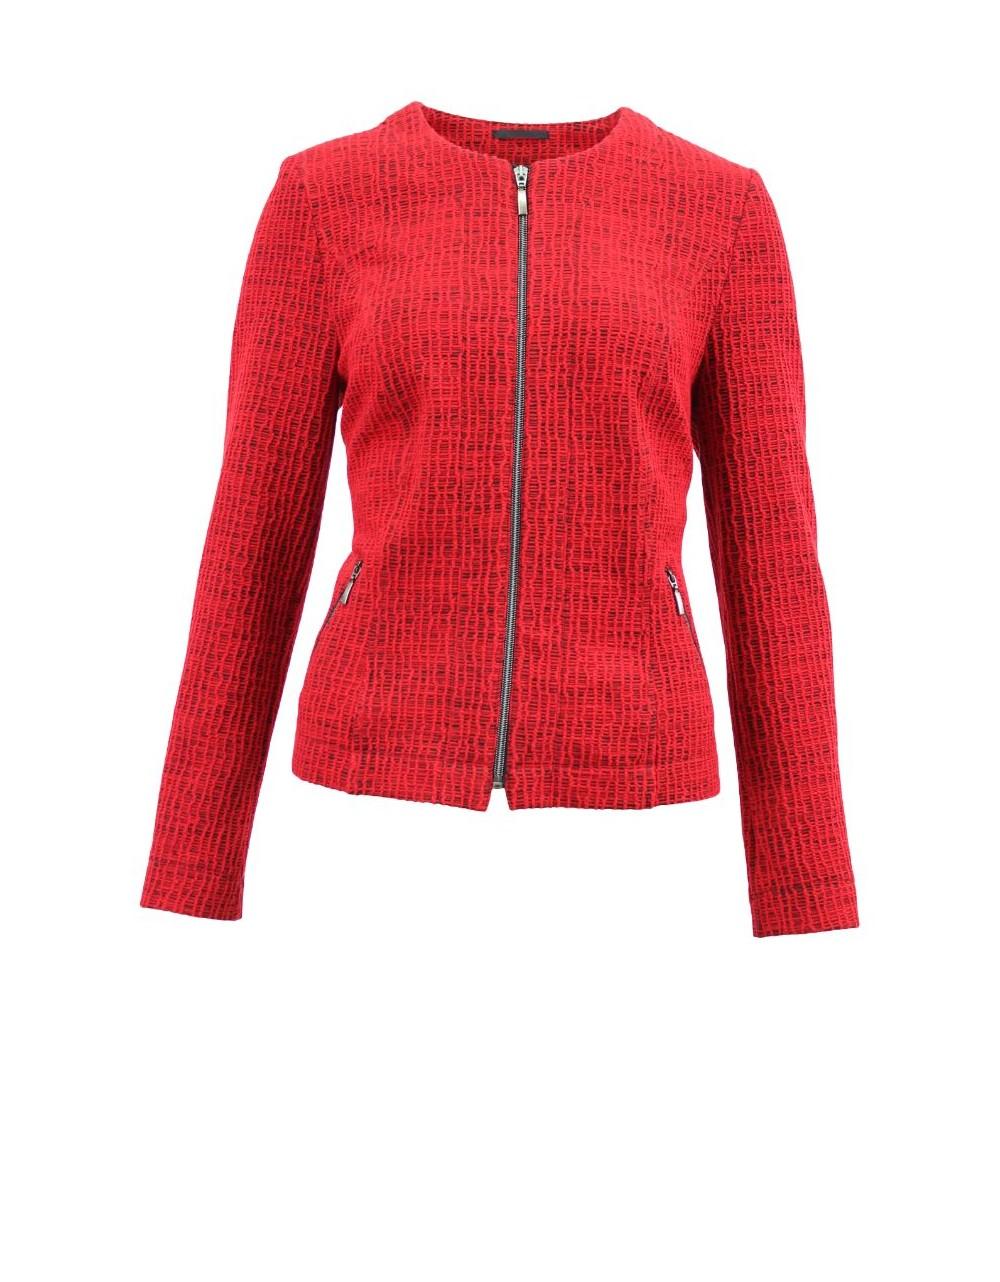 Lebek Cotton Rich Zipped Blazer Jacket|Barbara Lebek |Irish Handcrafts